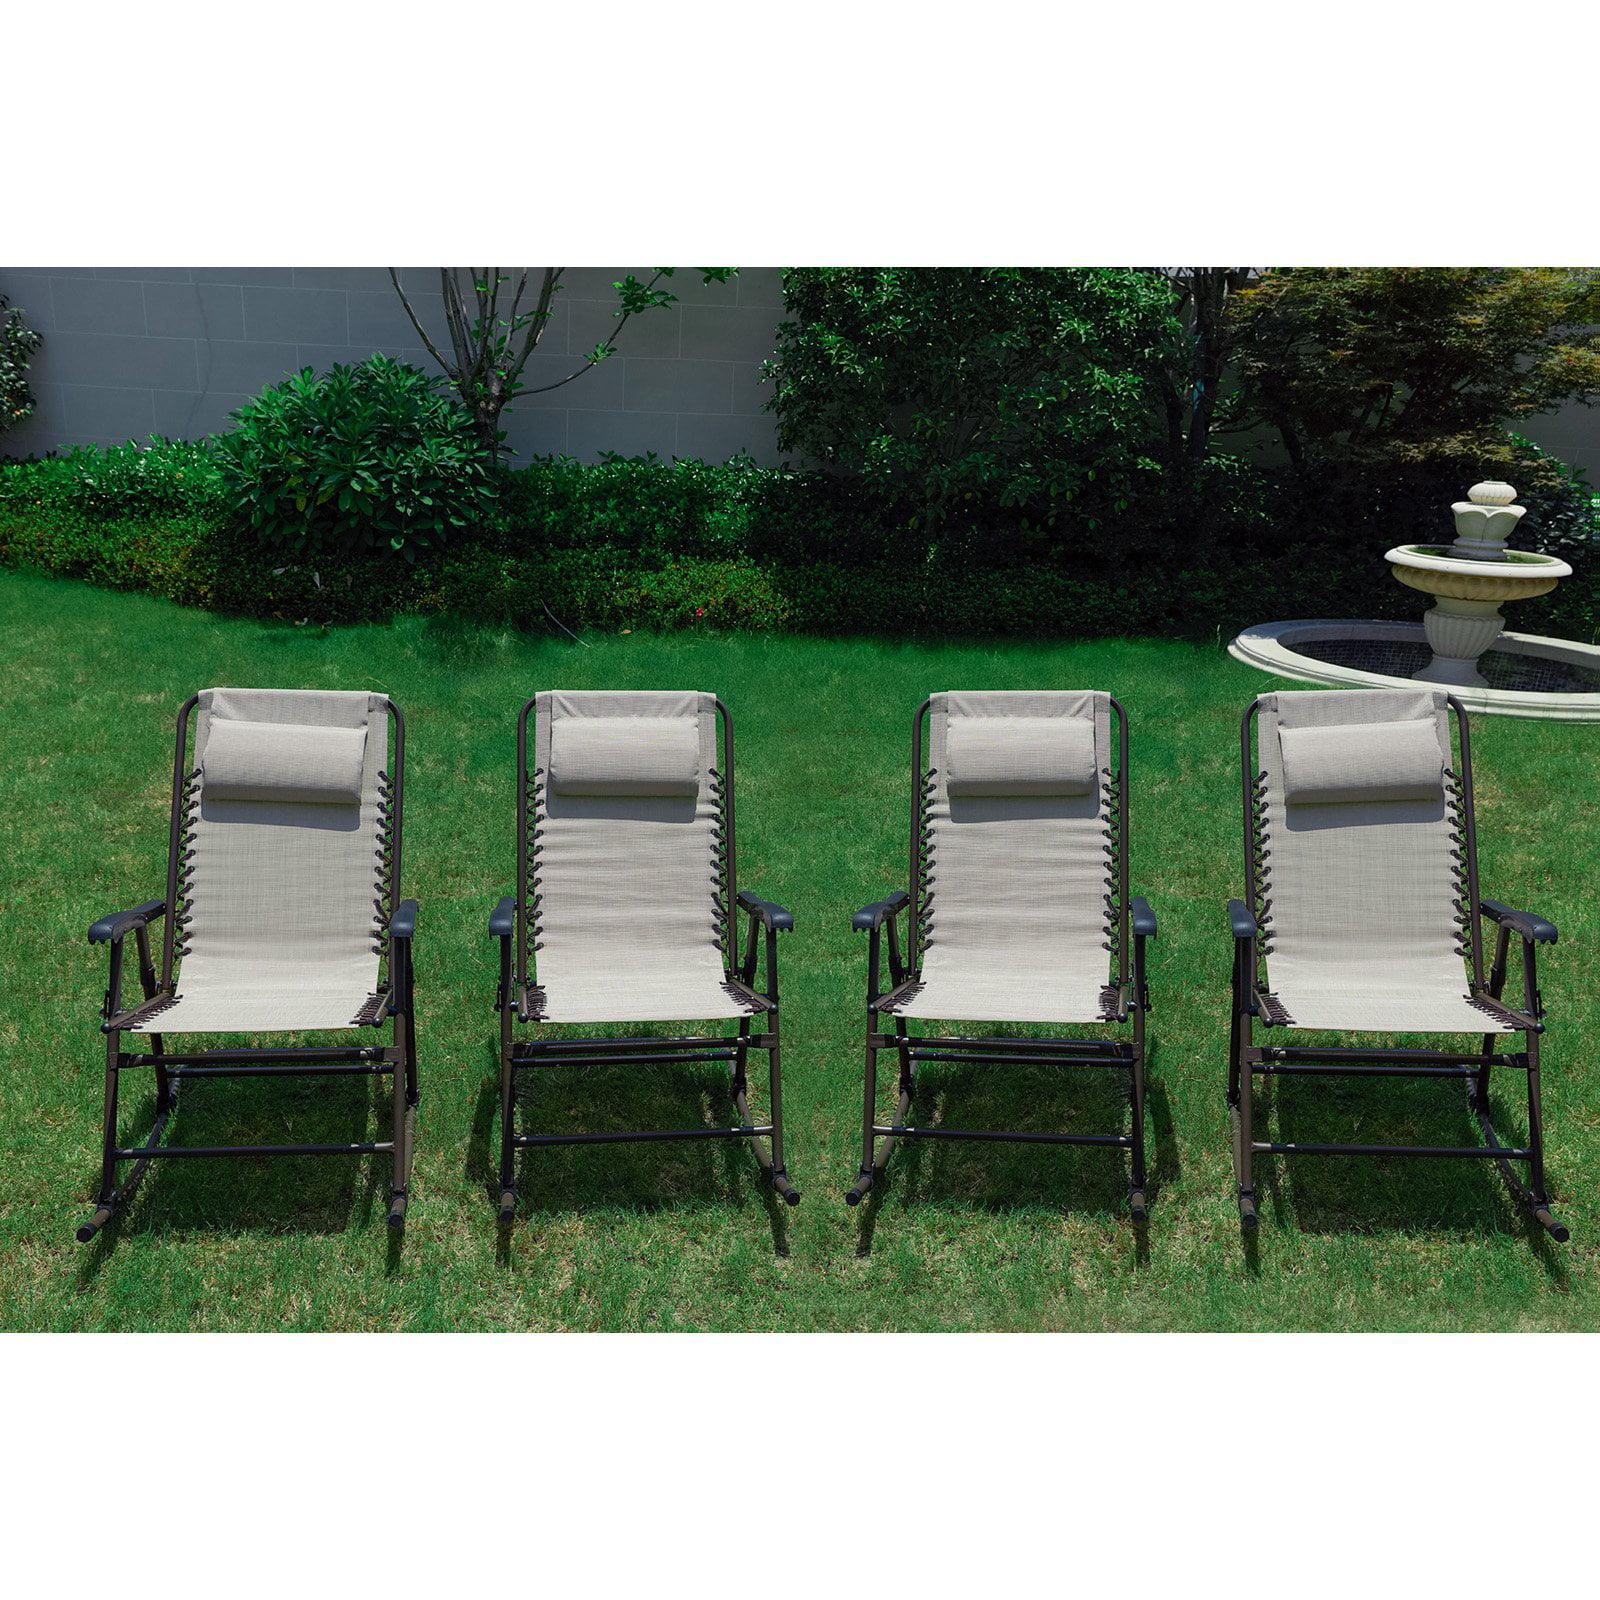 Every Season Folding Steel Outdoor Rocking Chair - Set of 4